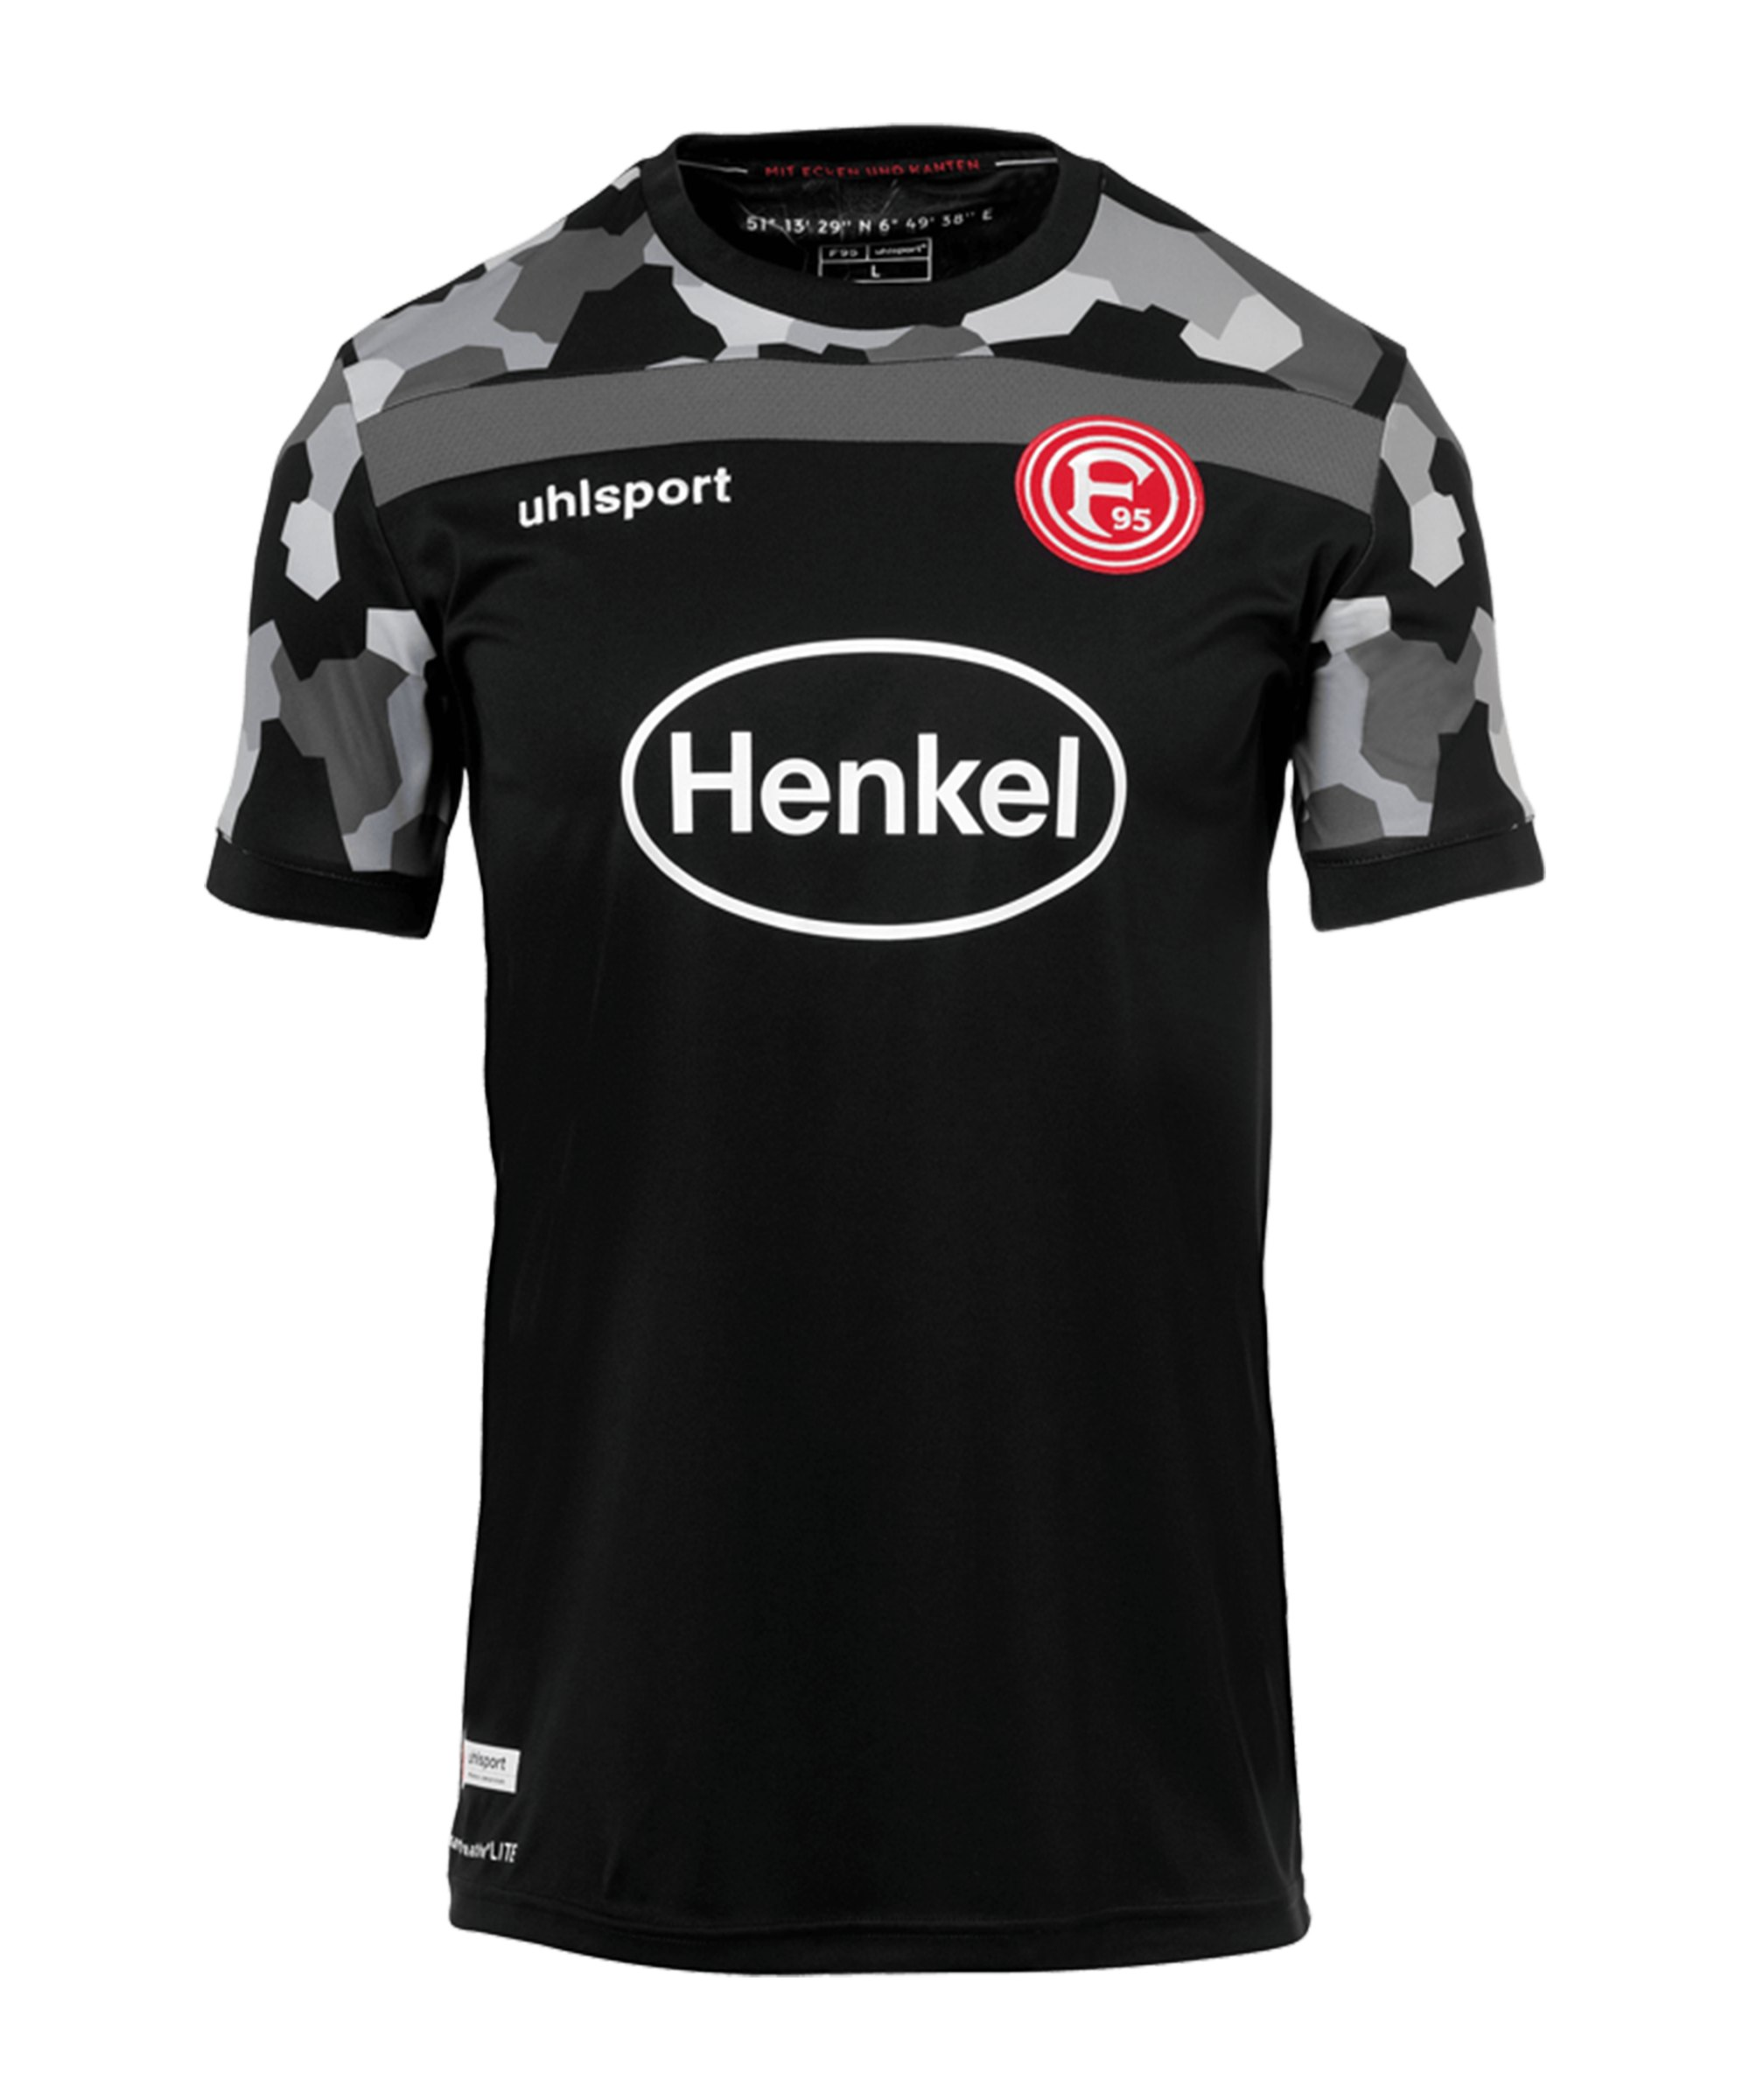 Uhlsport Fortuna Düsseldorf Trikot 3rd 2020/2021 Kids Schwarz - schwarz